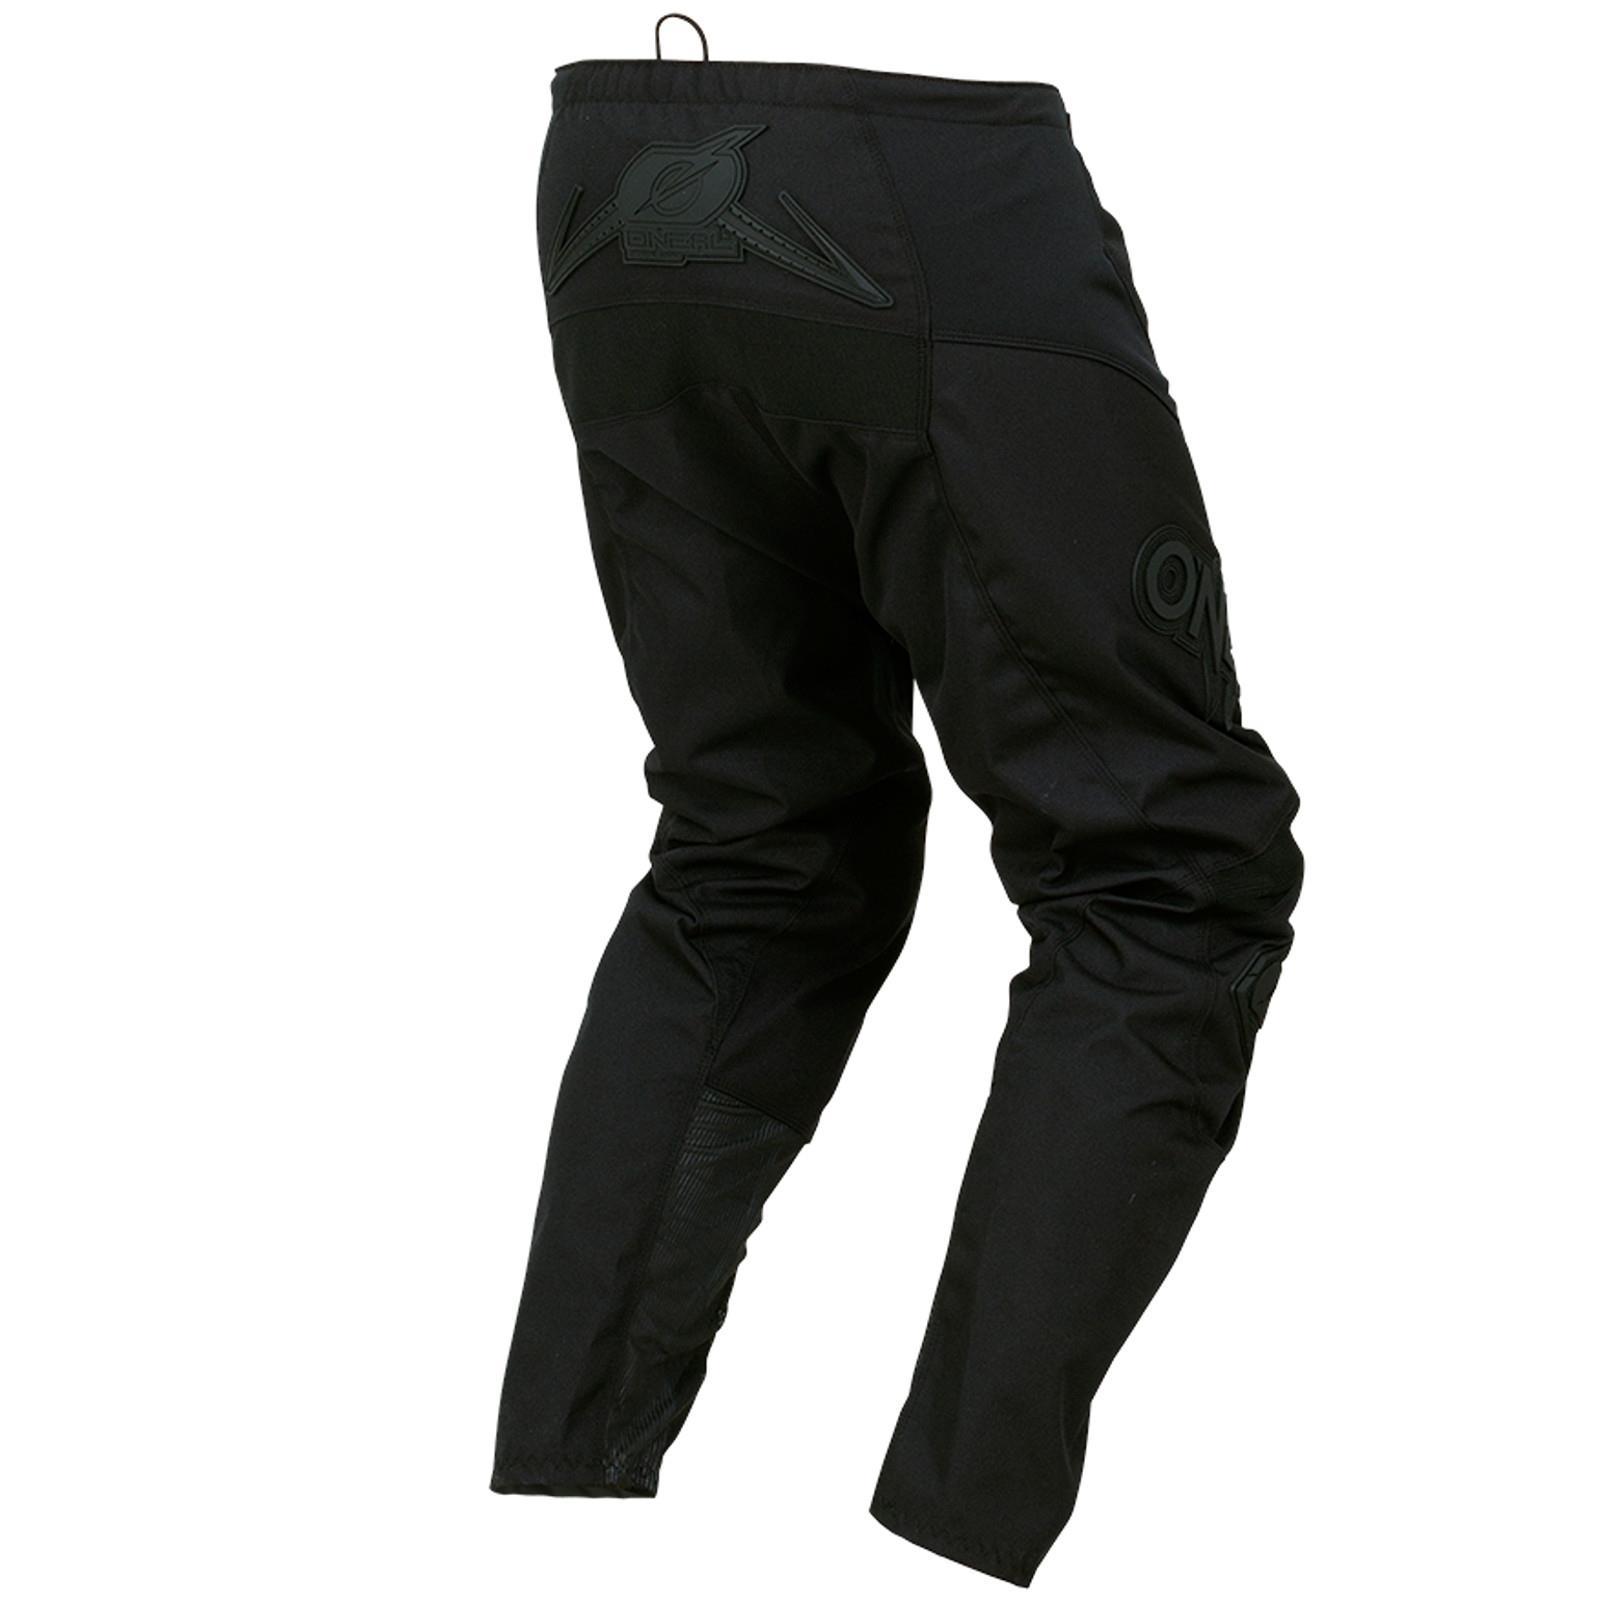 Oneal-elemento-Mayhem-Hardwear-Pants-pantalones-MX-DH-FR-Moto-Cross-Enduro-MTB-moto miniatura 63